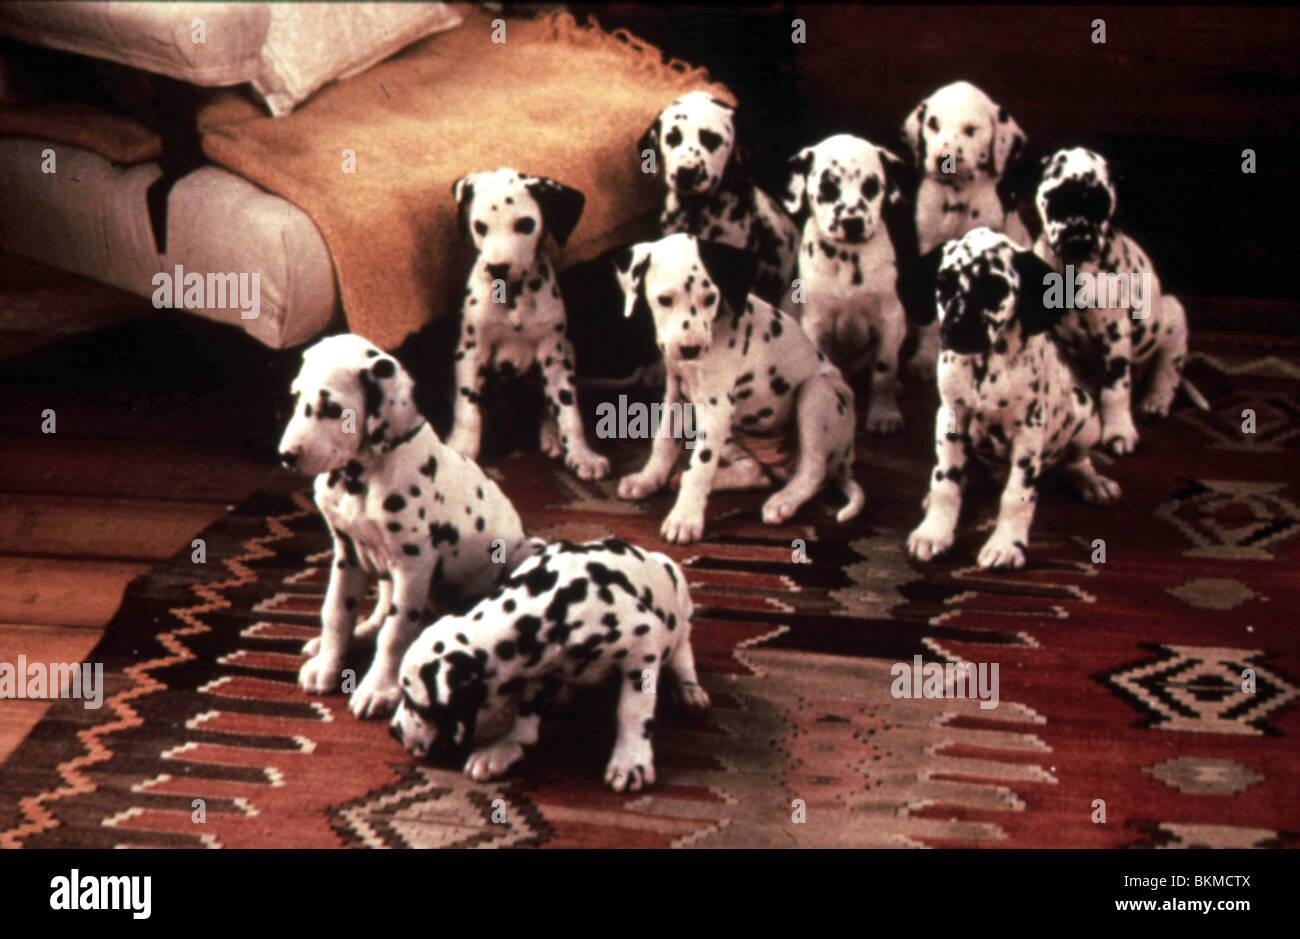 101 DALMATIANS -1996 Stock Photo